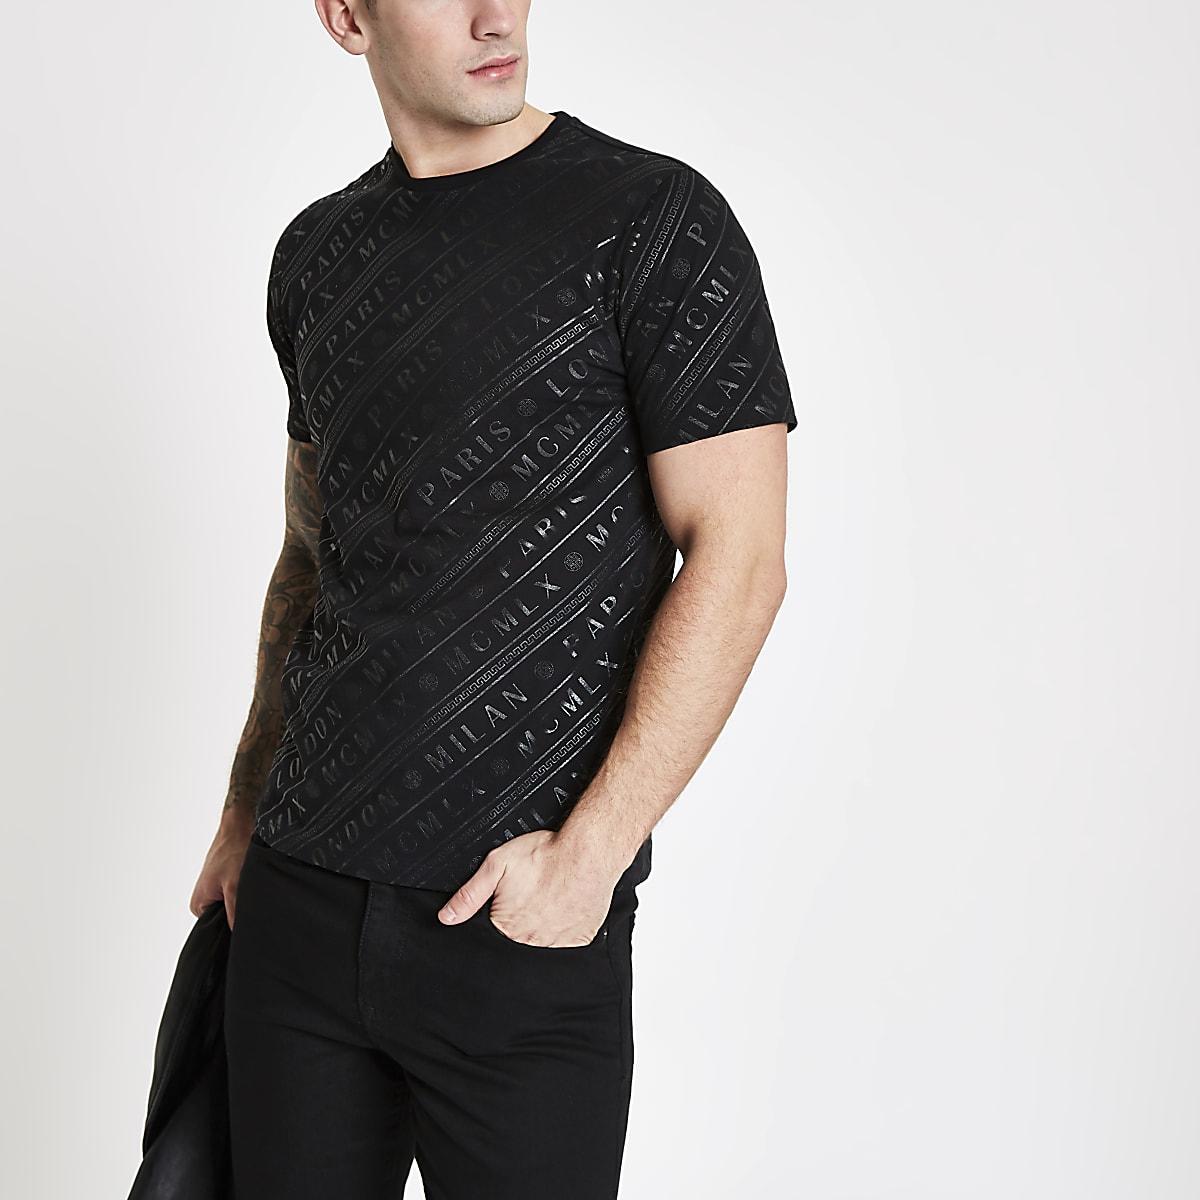 Black 'MCMLX' slim fit short sleeve T-shirt